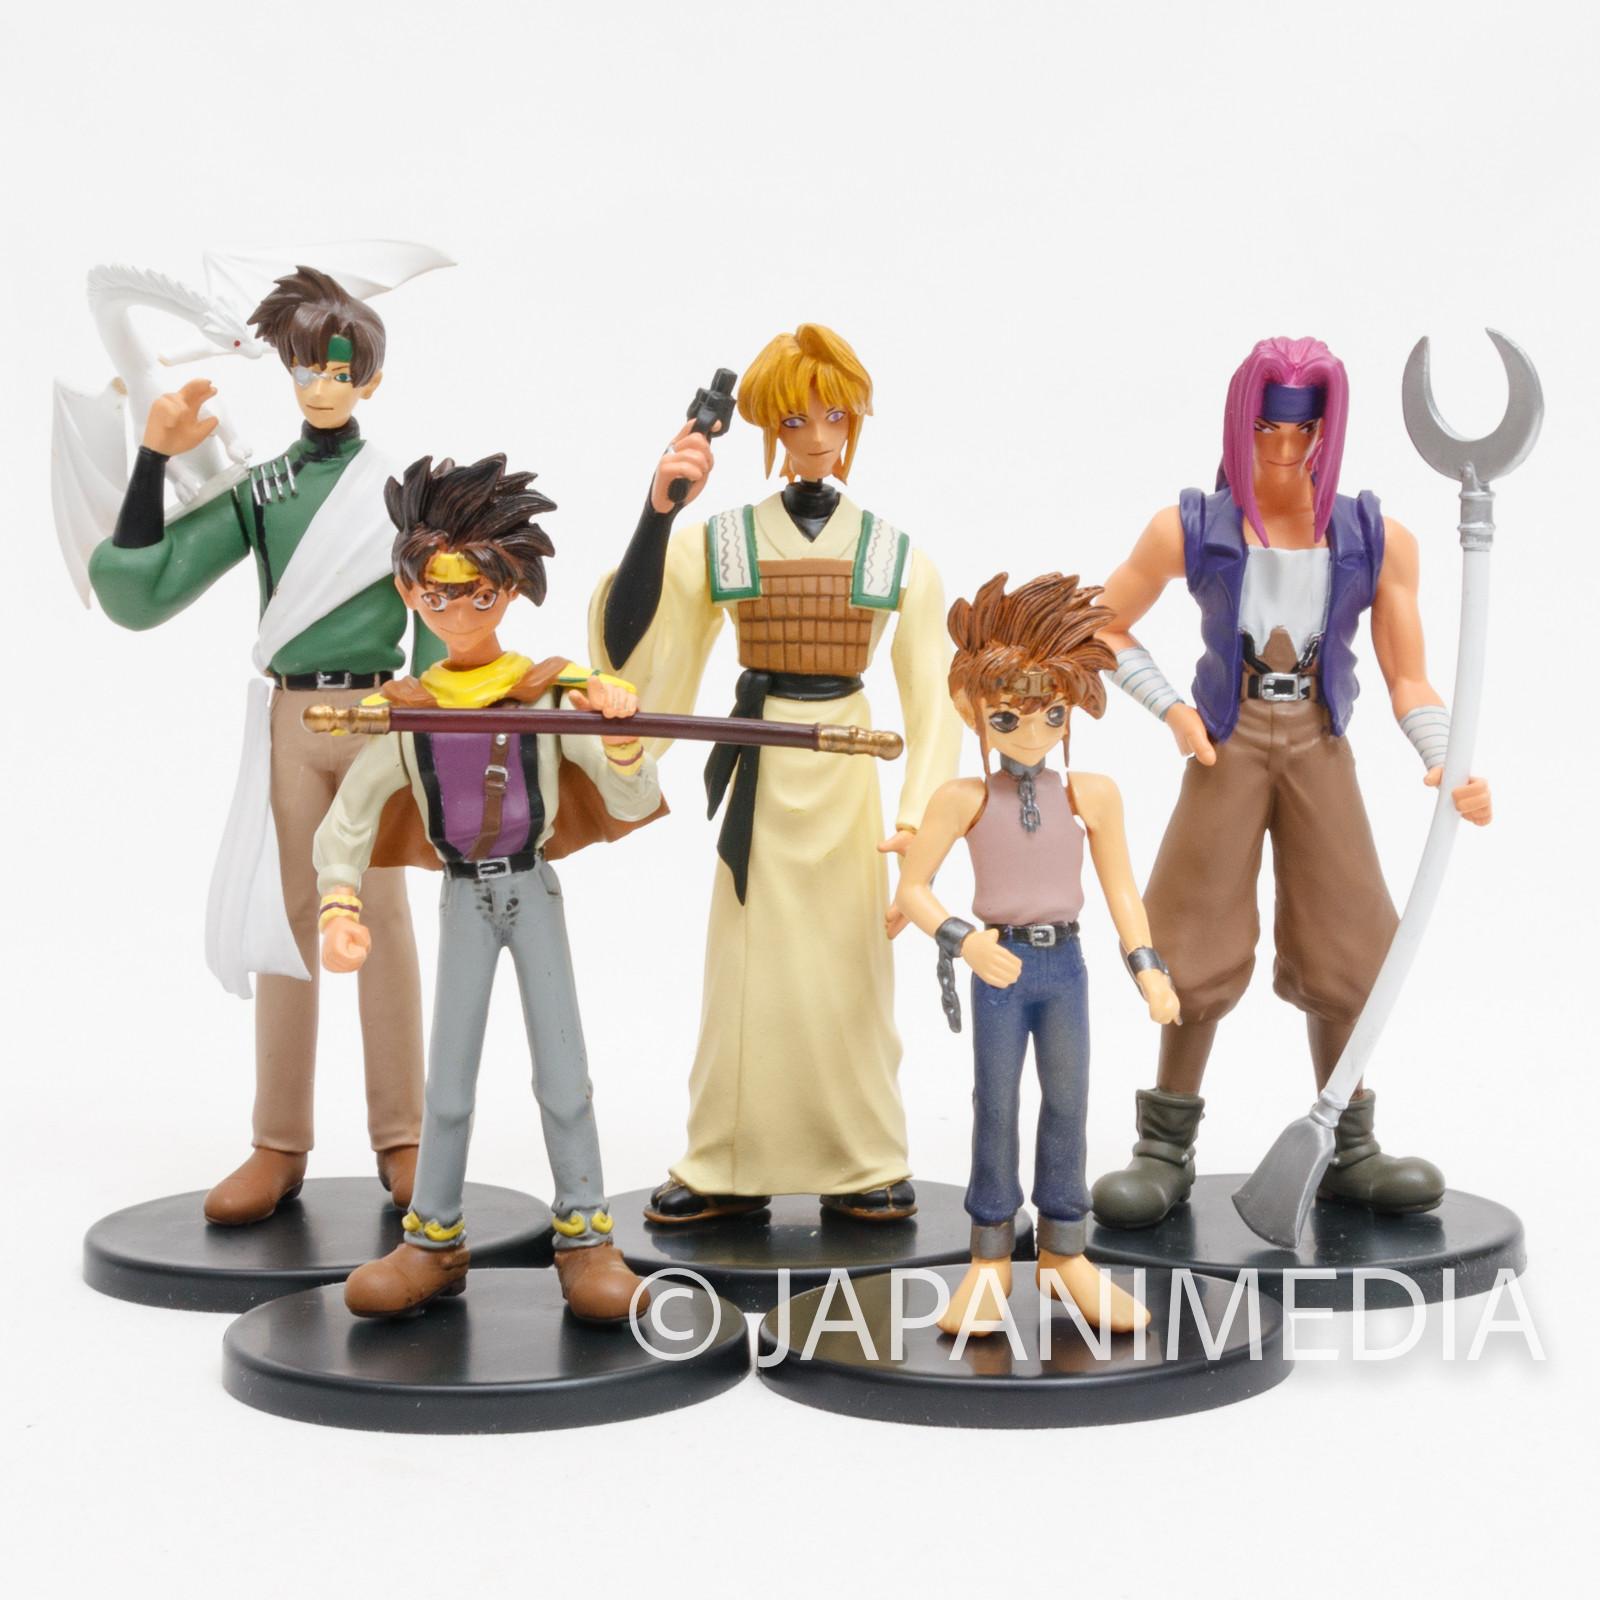 Gensomaden SAIYUKI Trading Figure 5pc Set [Sanzo / Goku / Gojyo / Hakkai / Goku (secret ver.) ] JAPAN